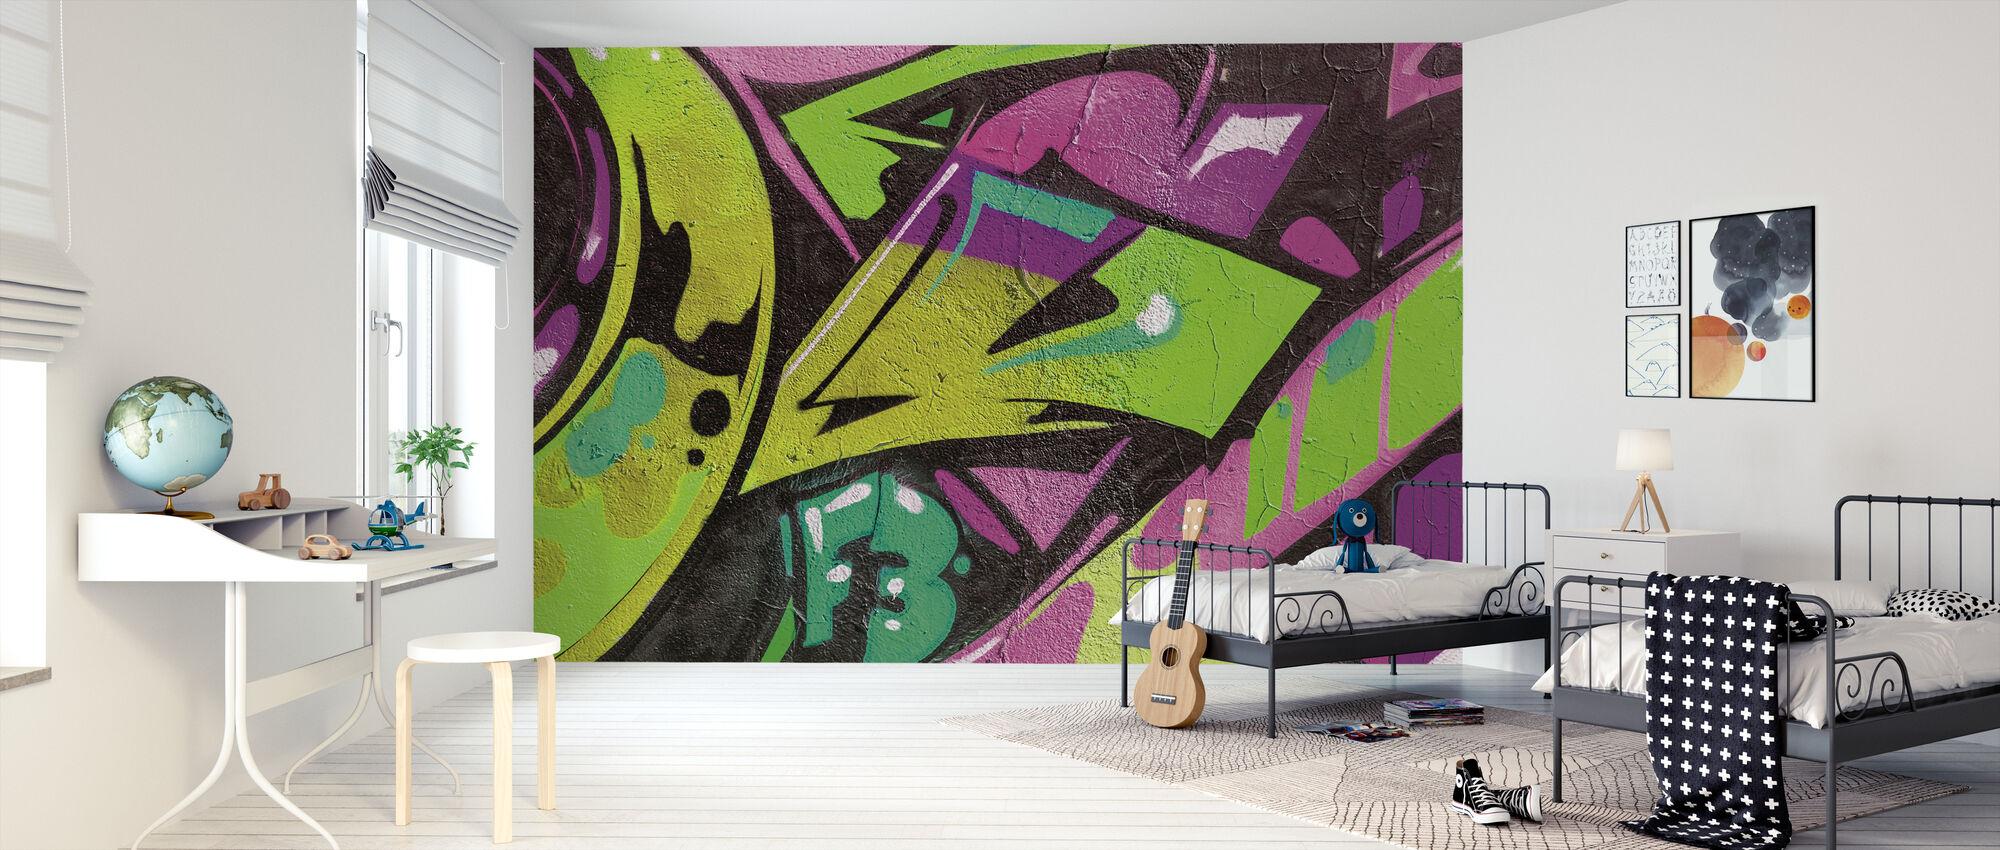 Urban Graffiti Detail - Wallpaper - Kids Room